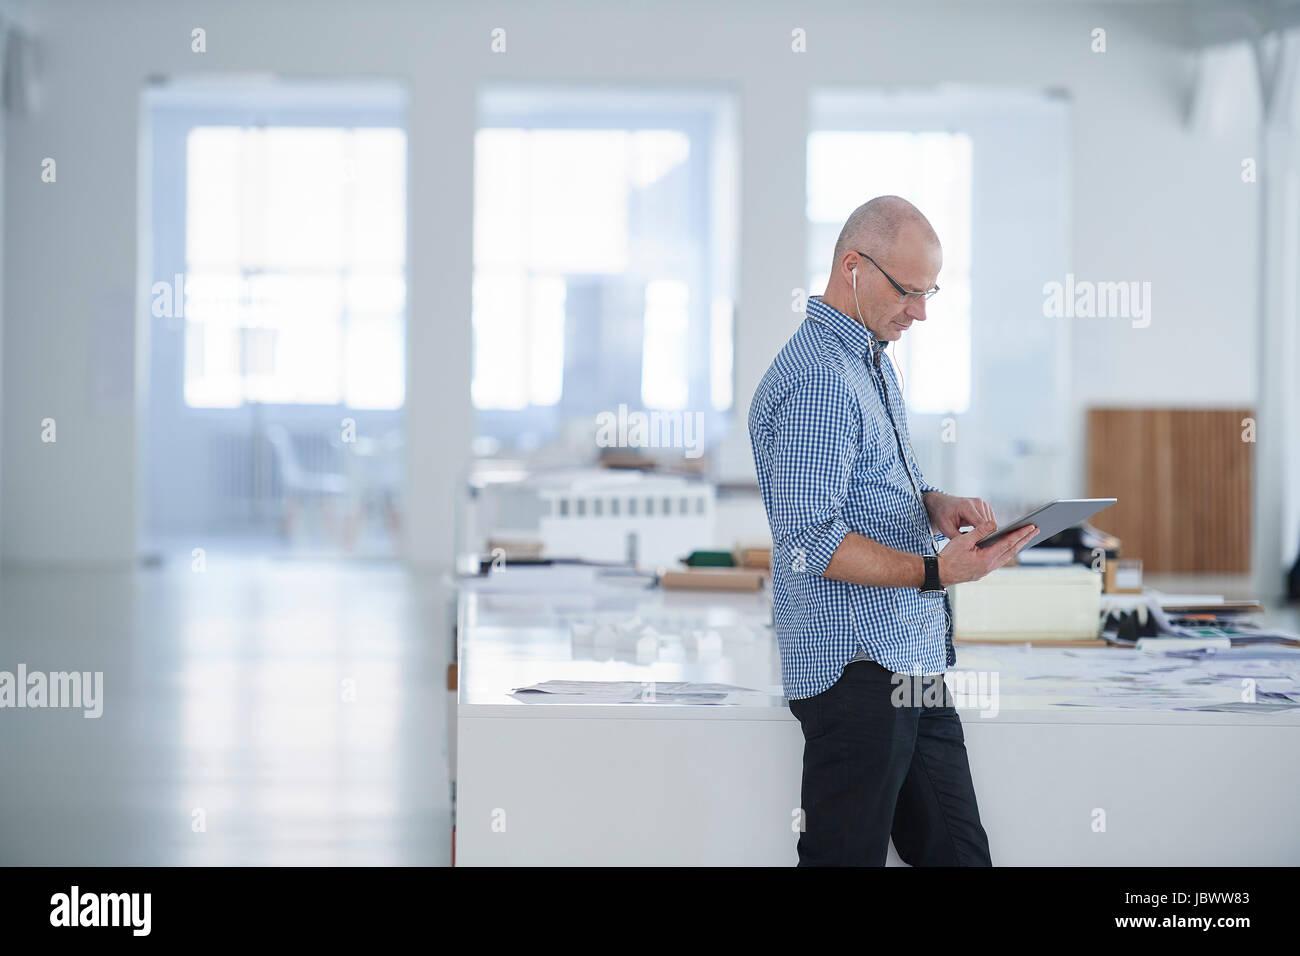 Man in open plan office using digital tablet - Stock Image